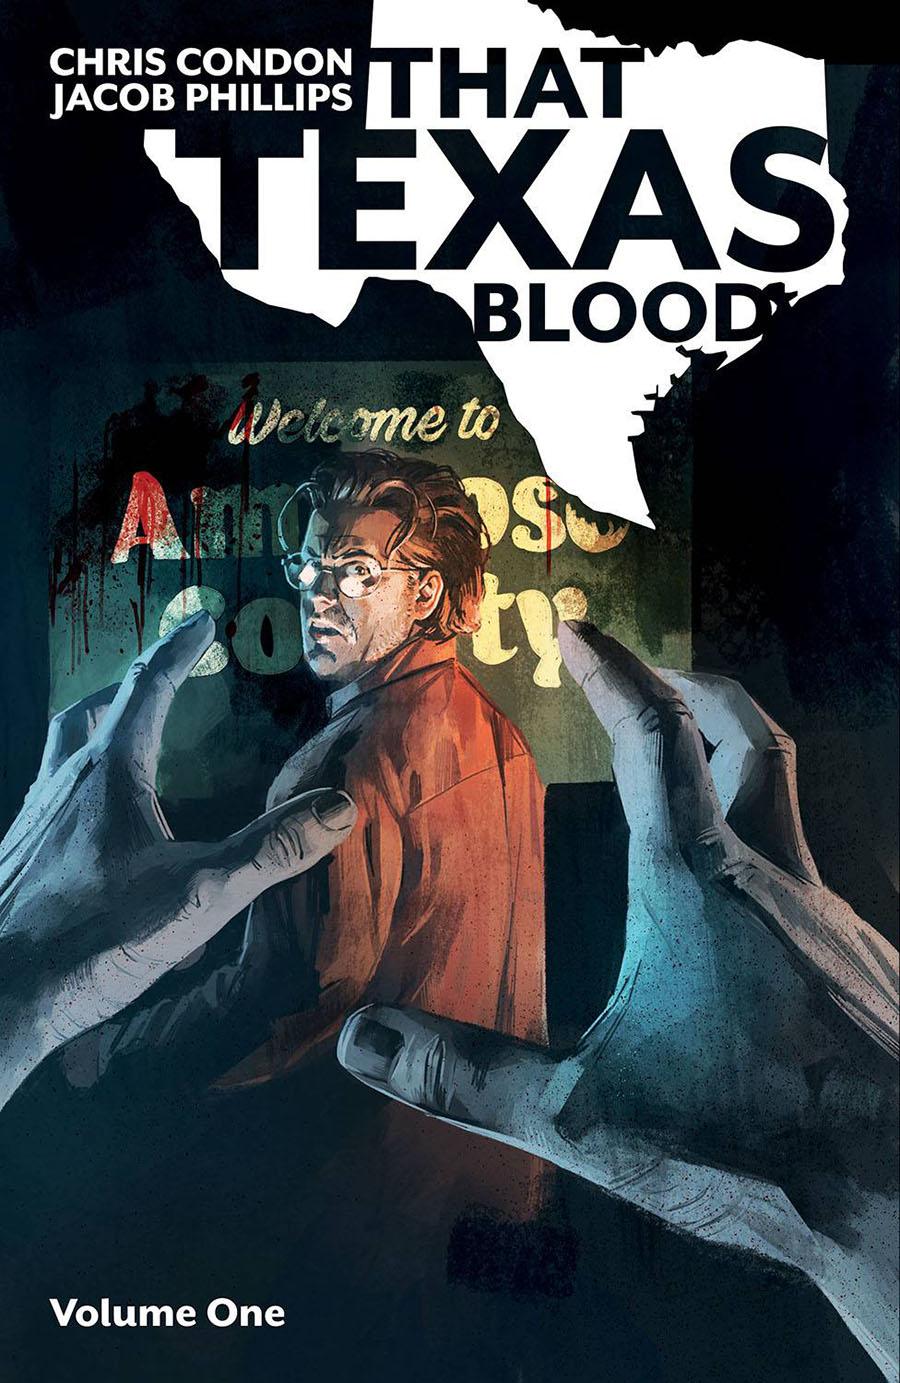 That Texas Blood Vol 1 TP